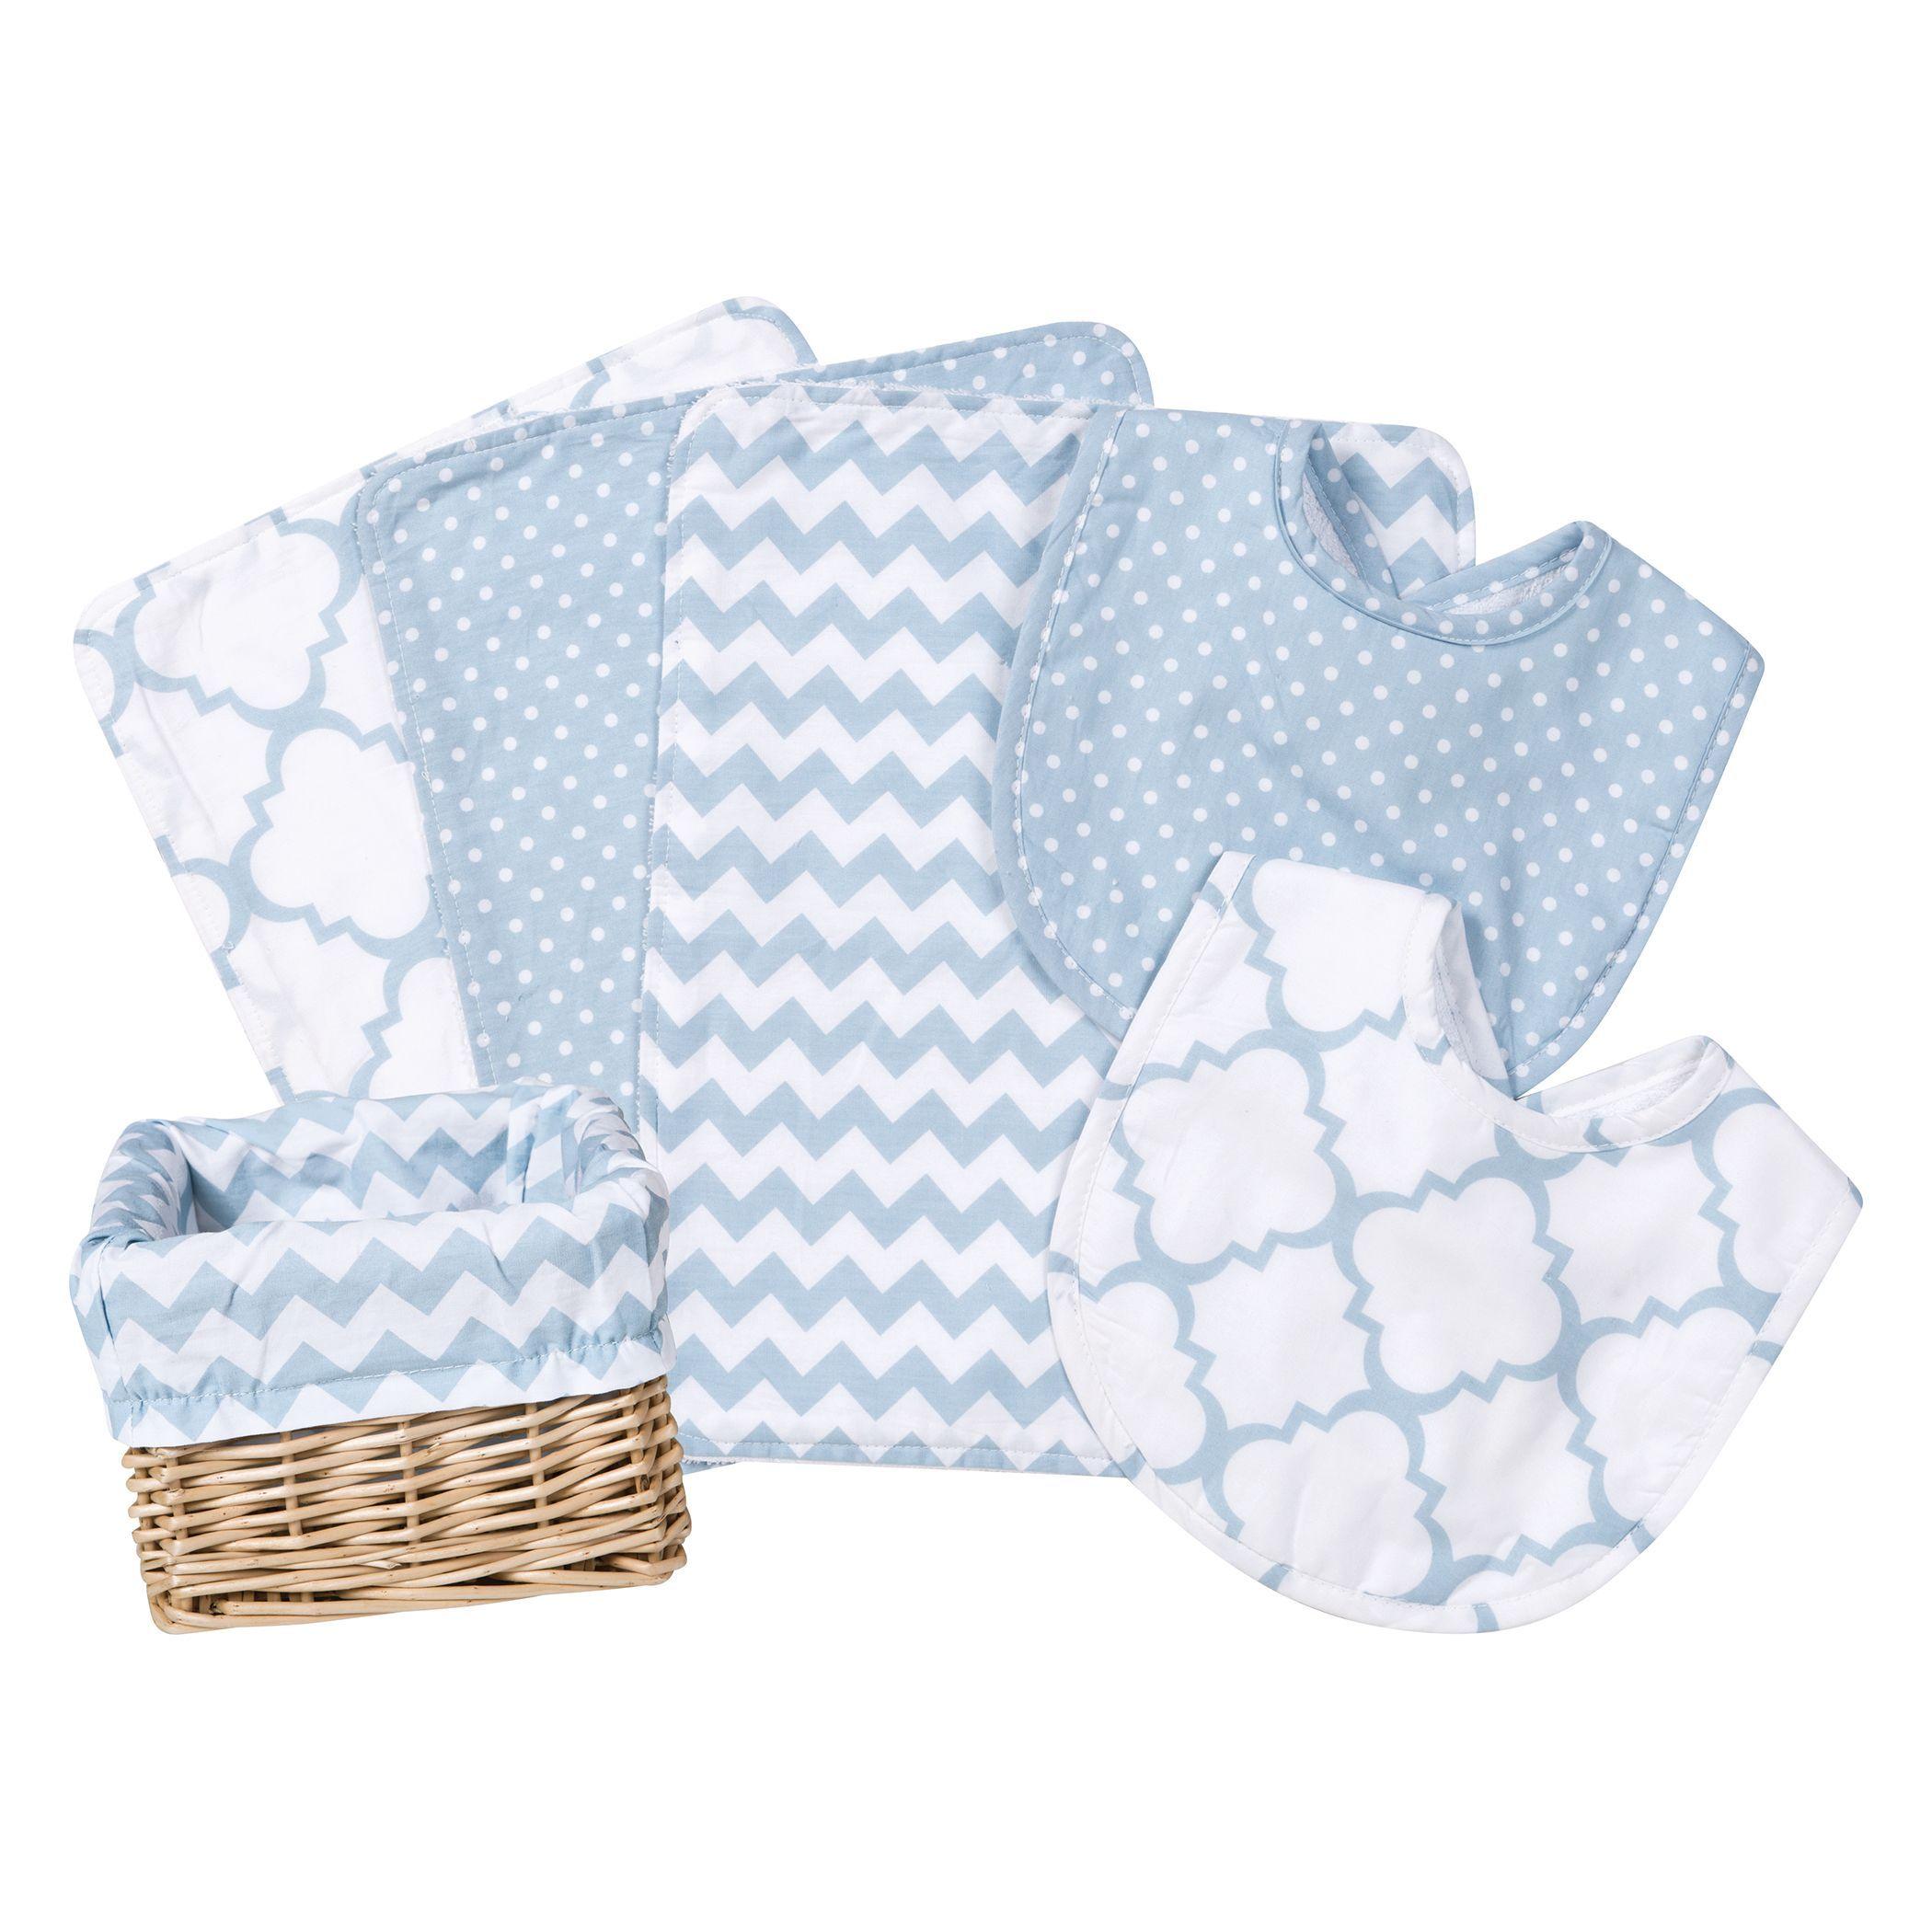 Baby Gift Set Feeding Basket Bib Burp Cloth Blanket 7 Piece Boy Girl Nursery New